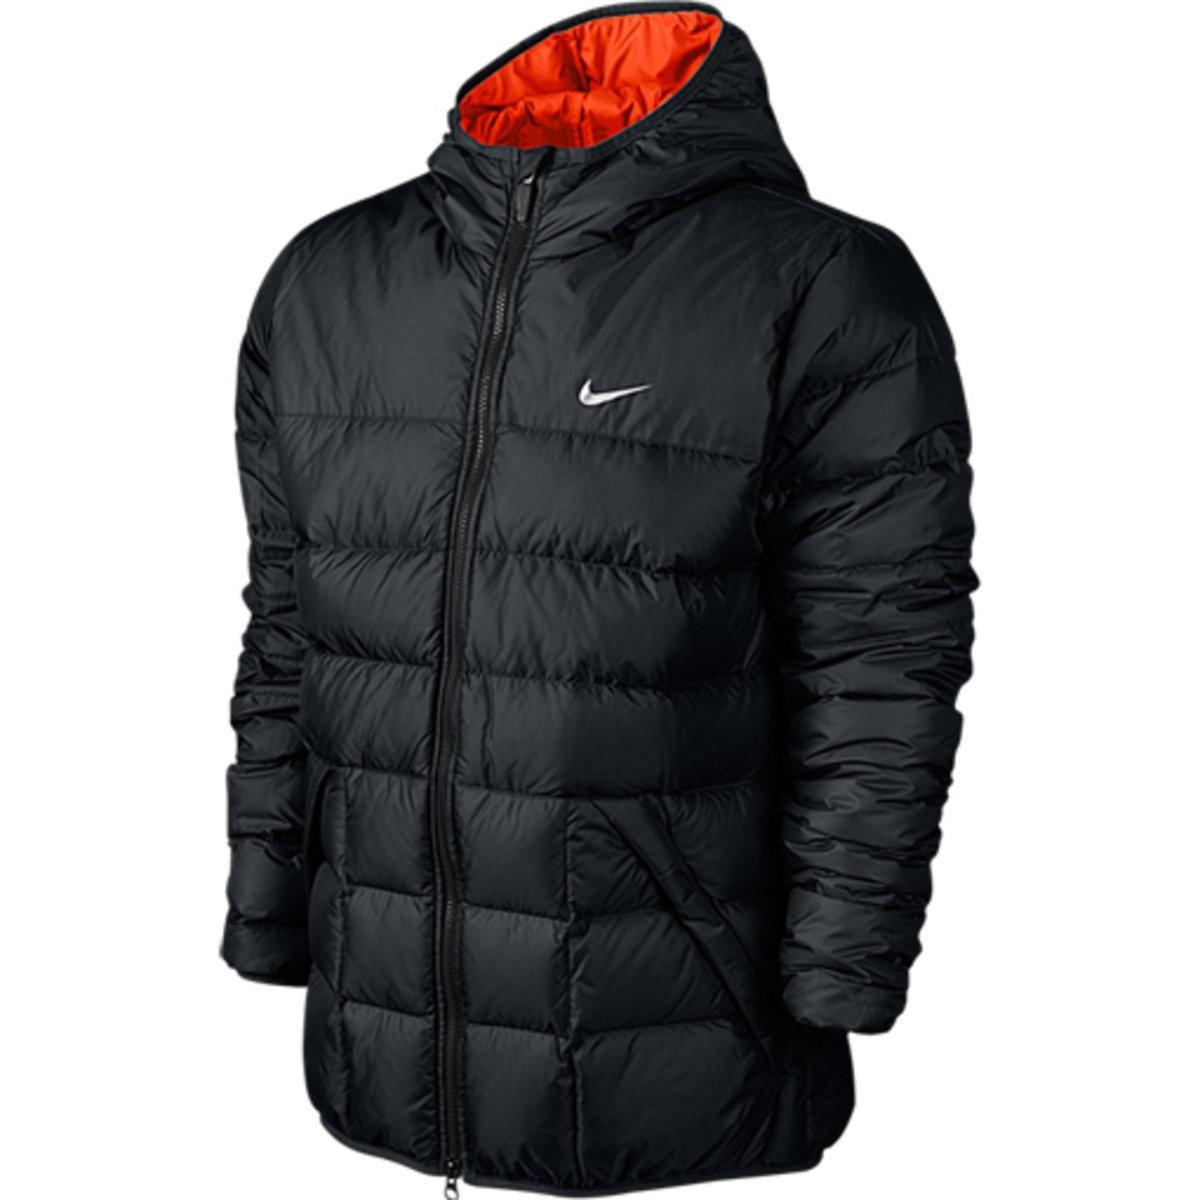 Doudoune homme Nike